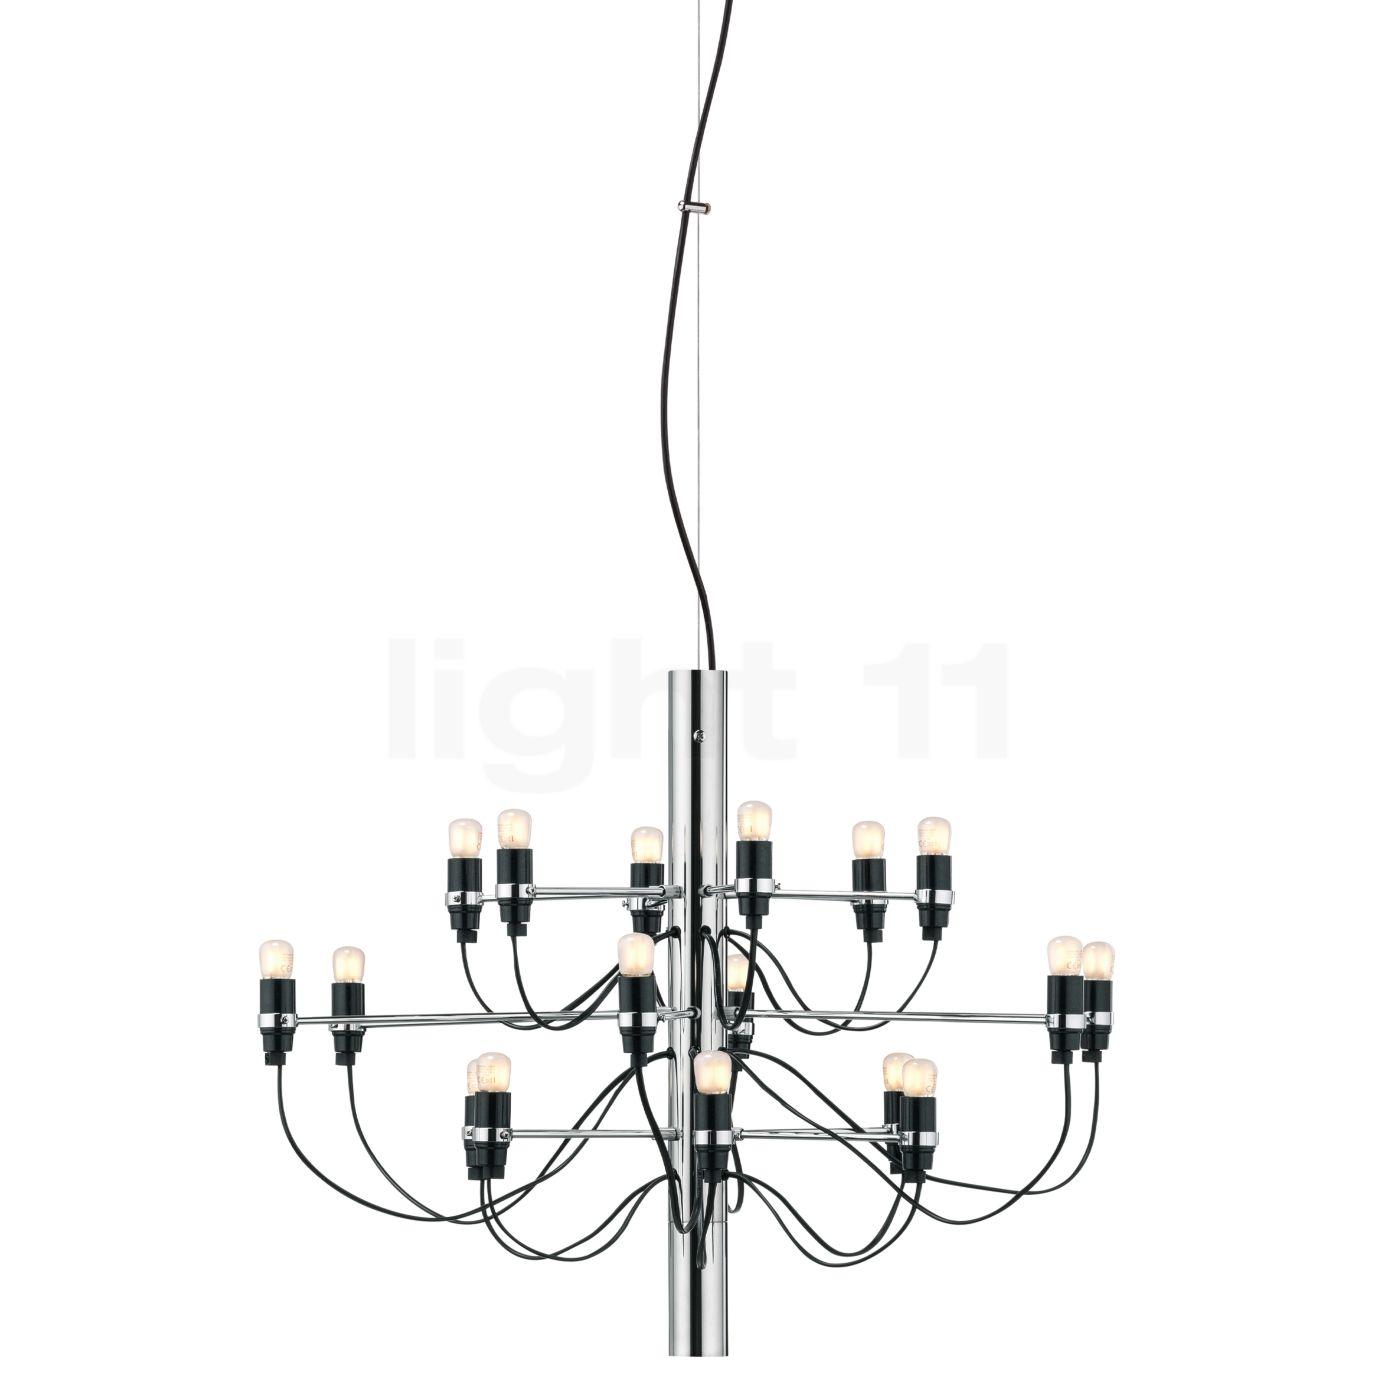 Flos 2097-18 inkl. LED Leuchtmittel, chrom glänzend - inkl. 18x Leuchtmittel matt A1351057